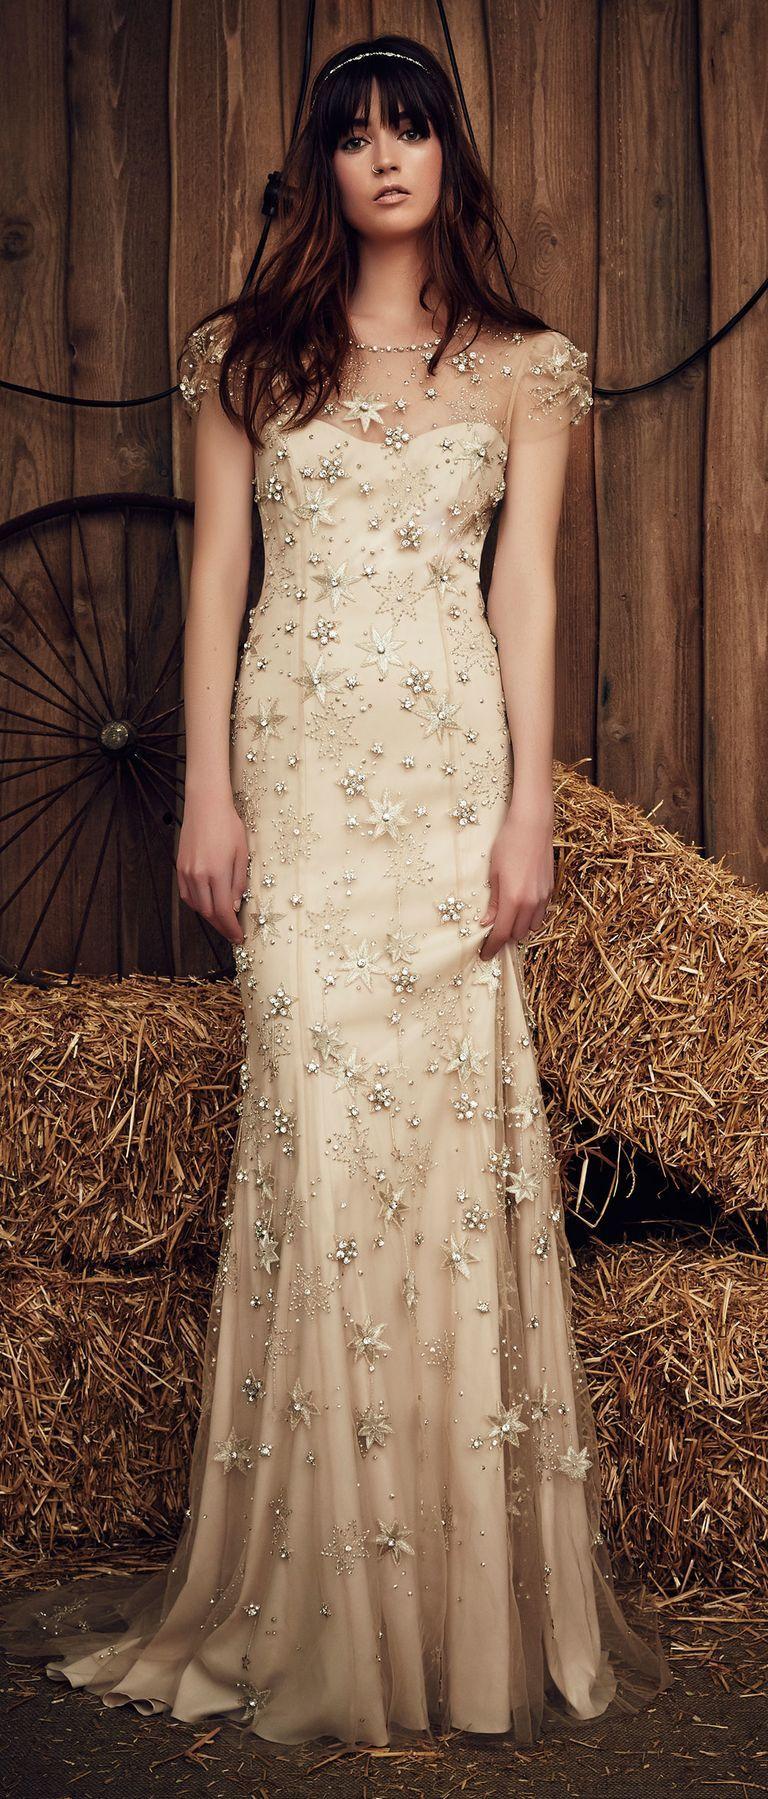 See Jenny Packham's Wedding Dresses From Bridal Fashion ...